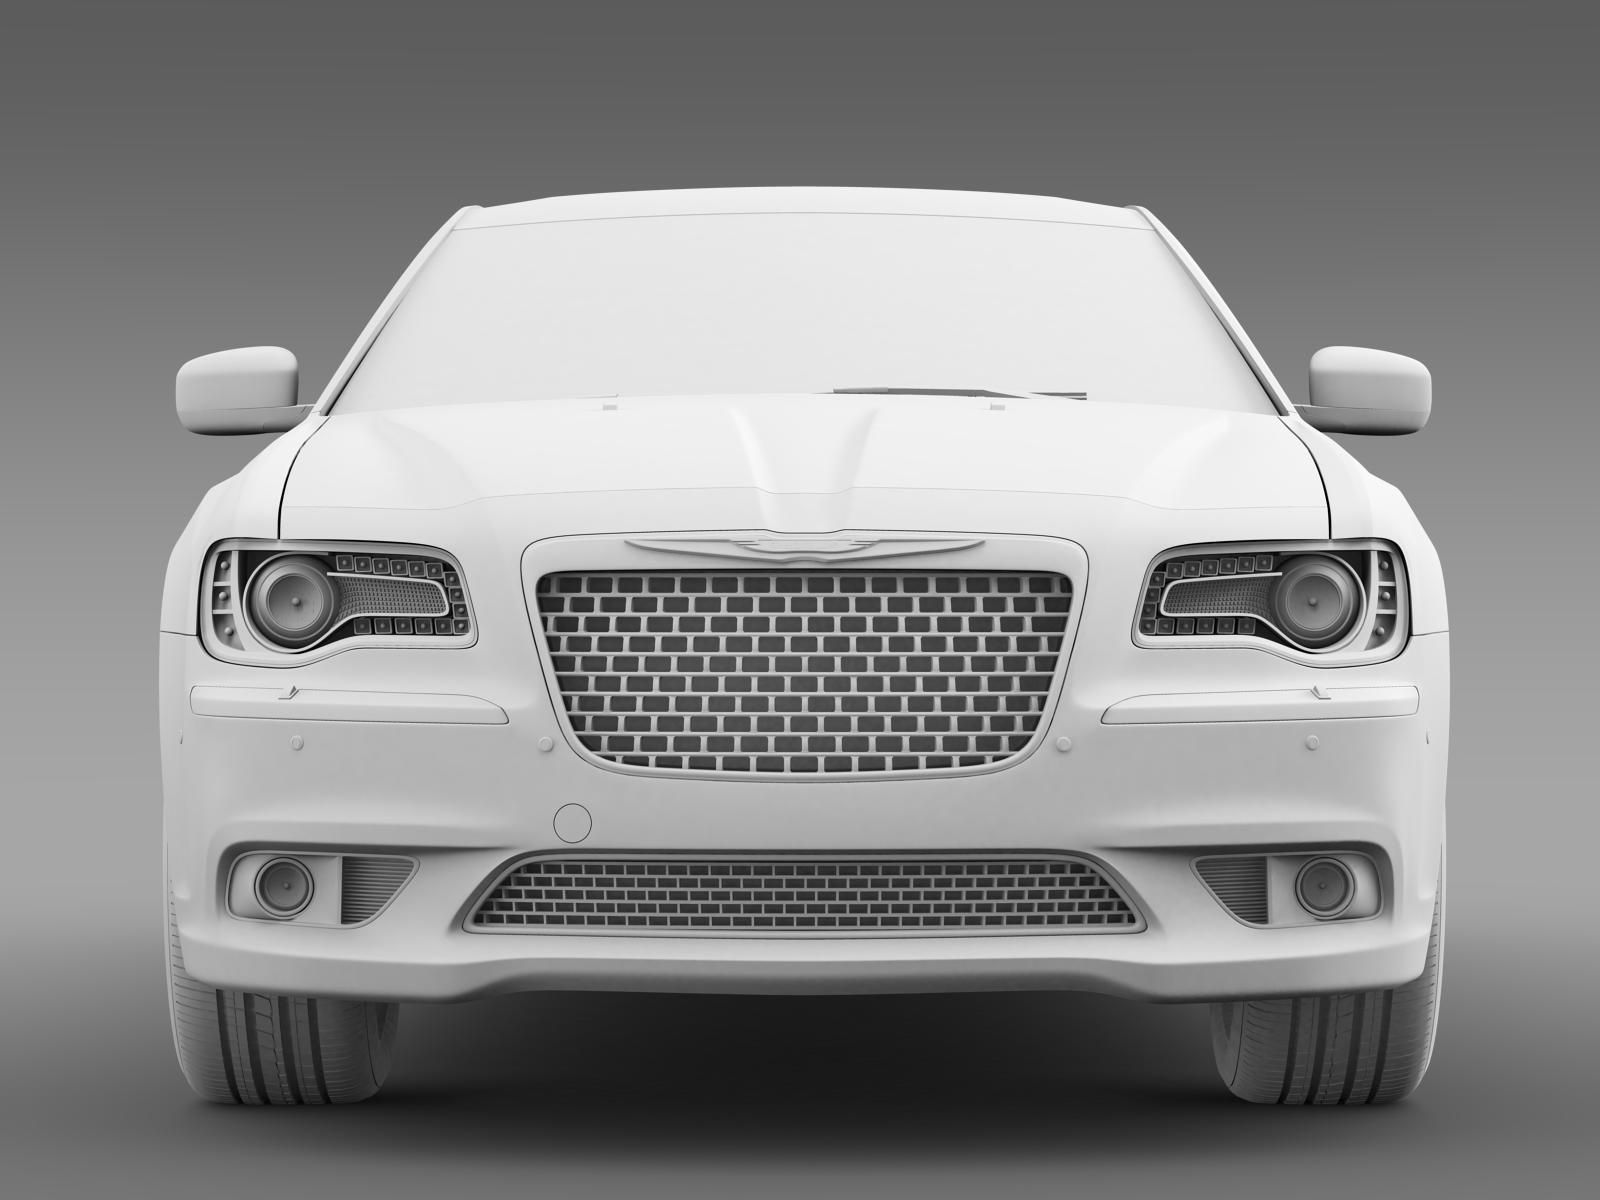 Chrysler 300 Grills - 2018 - 2019 New Car Reviews by Language Kompis